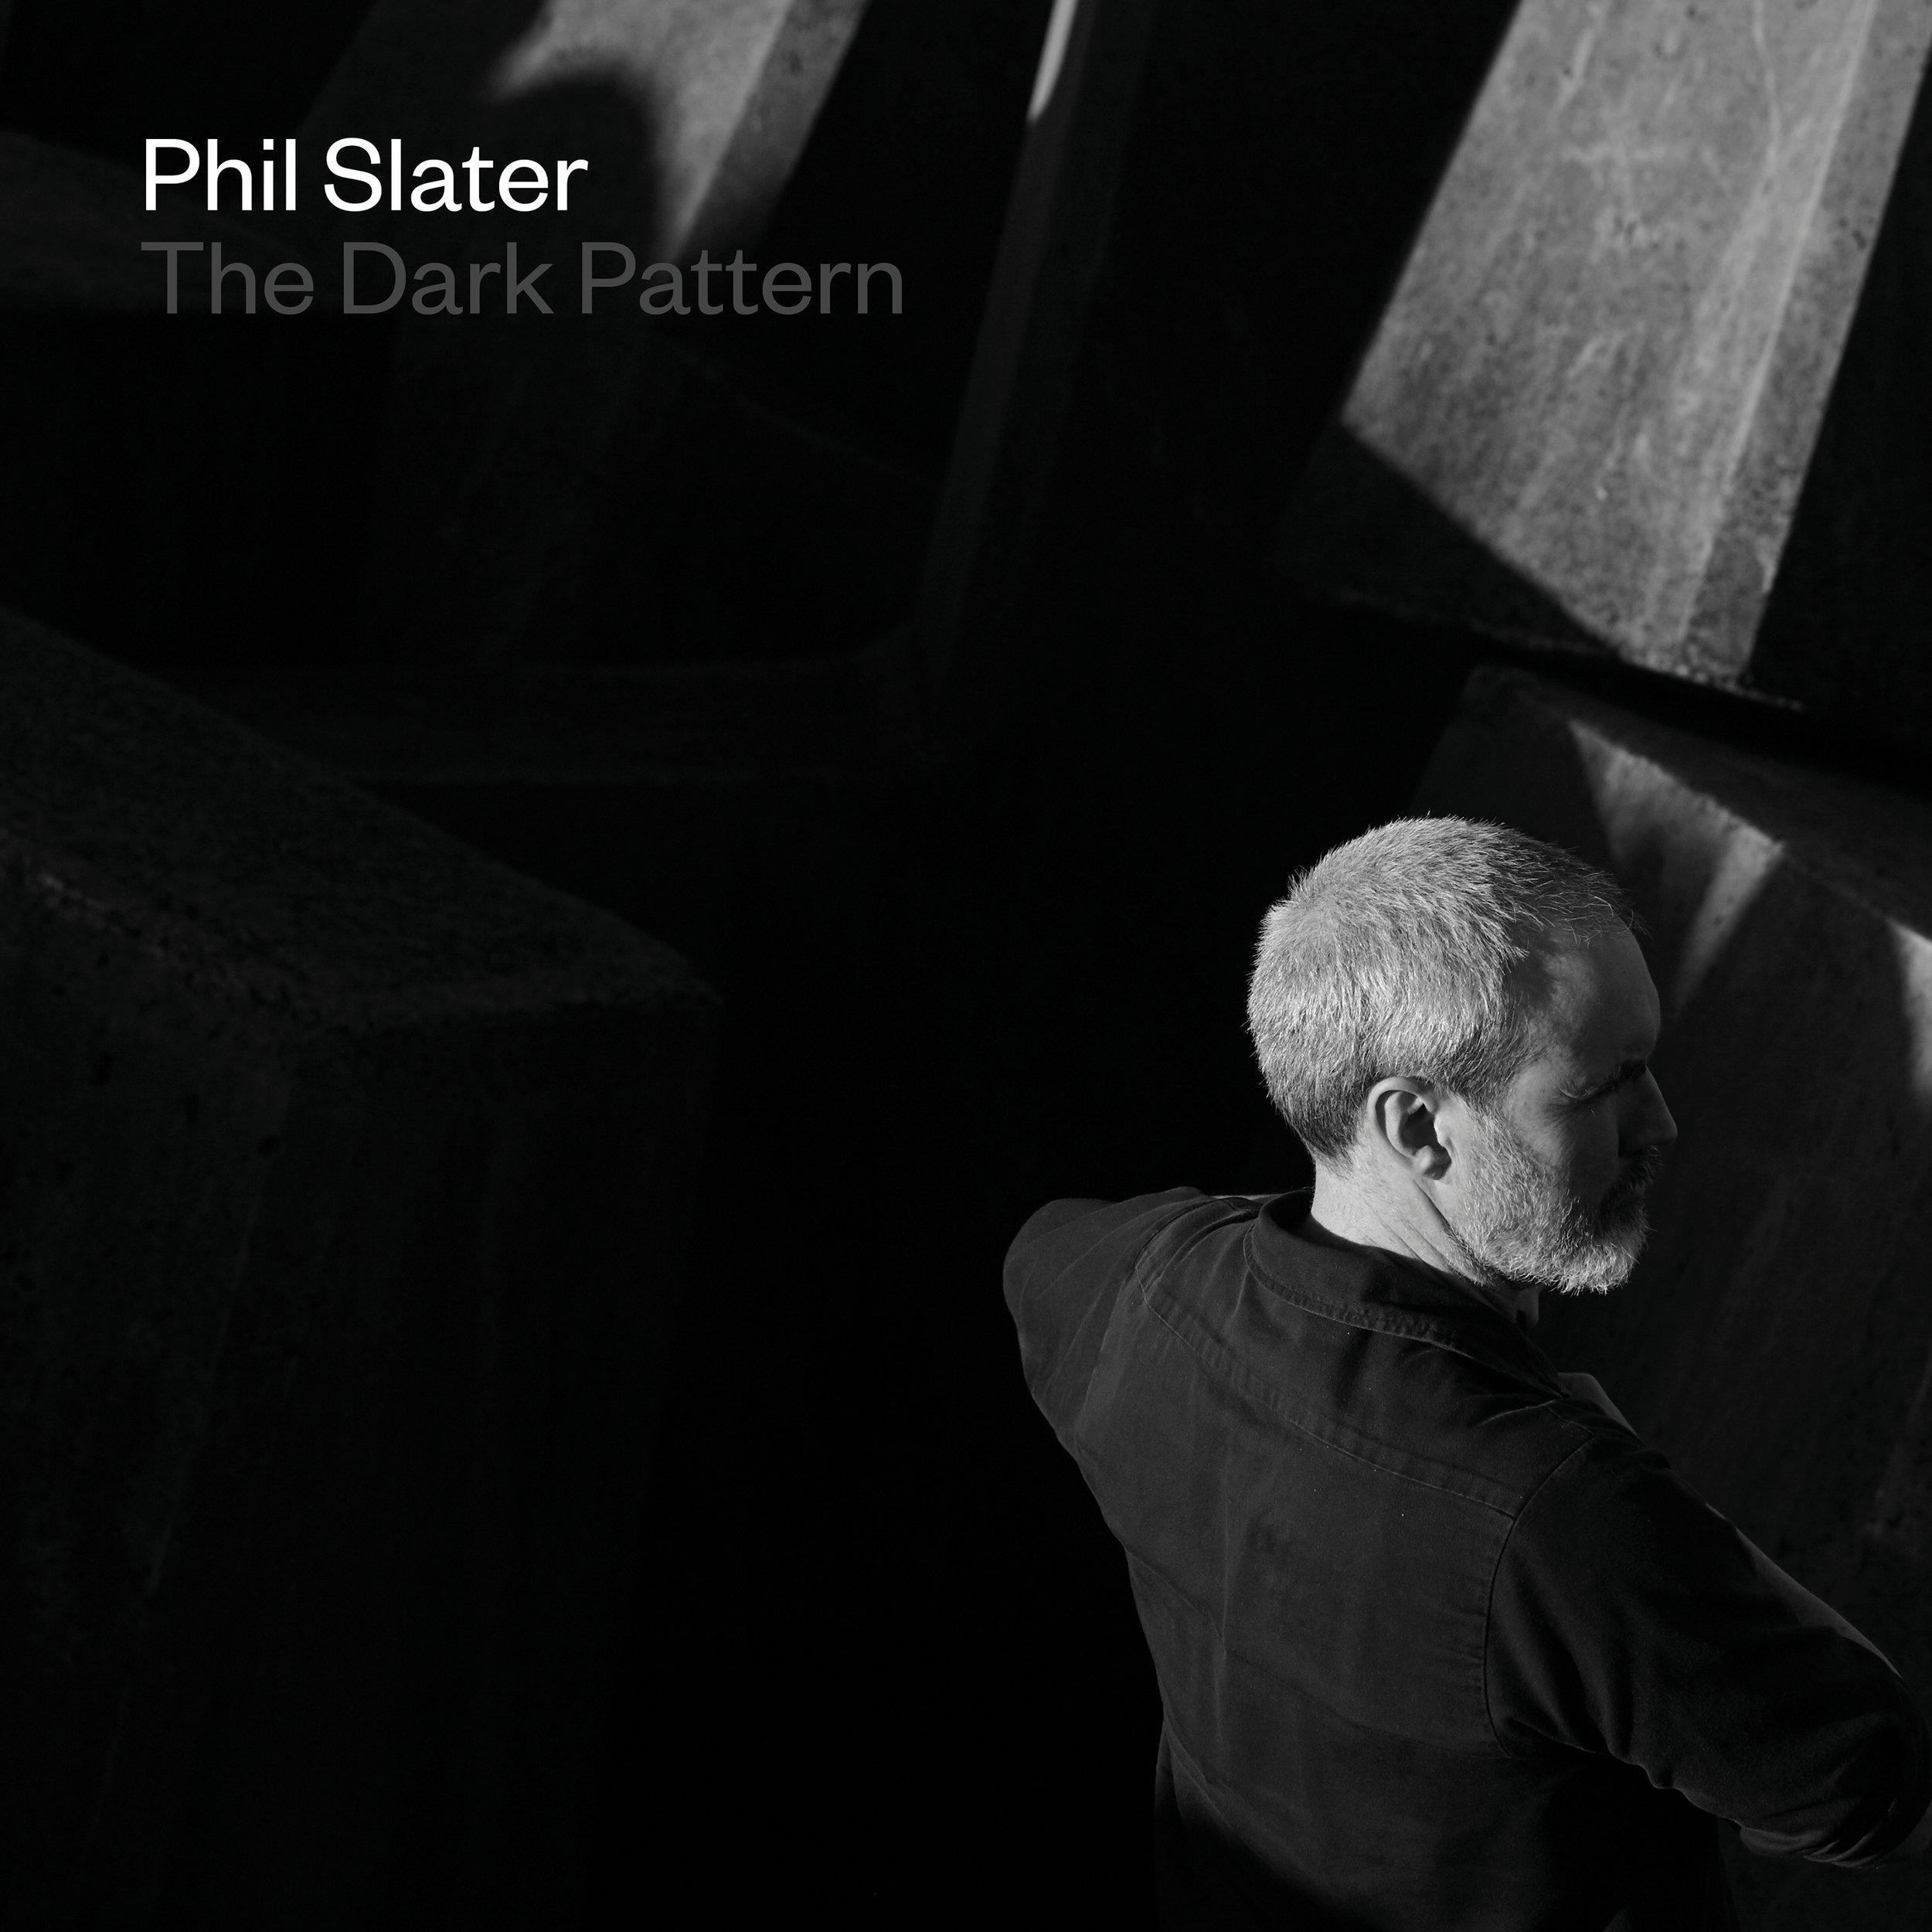 PS_The-Dark-Pattern_3000x3000_02.jpg